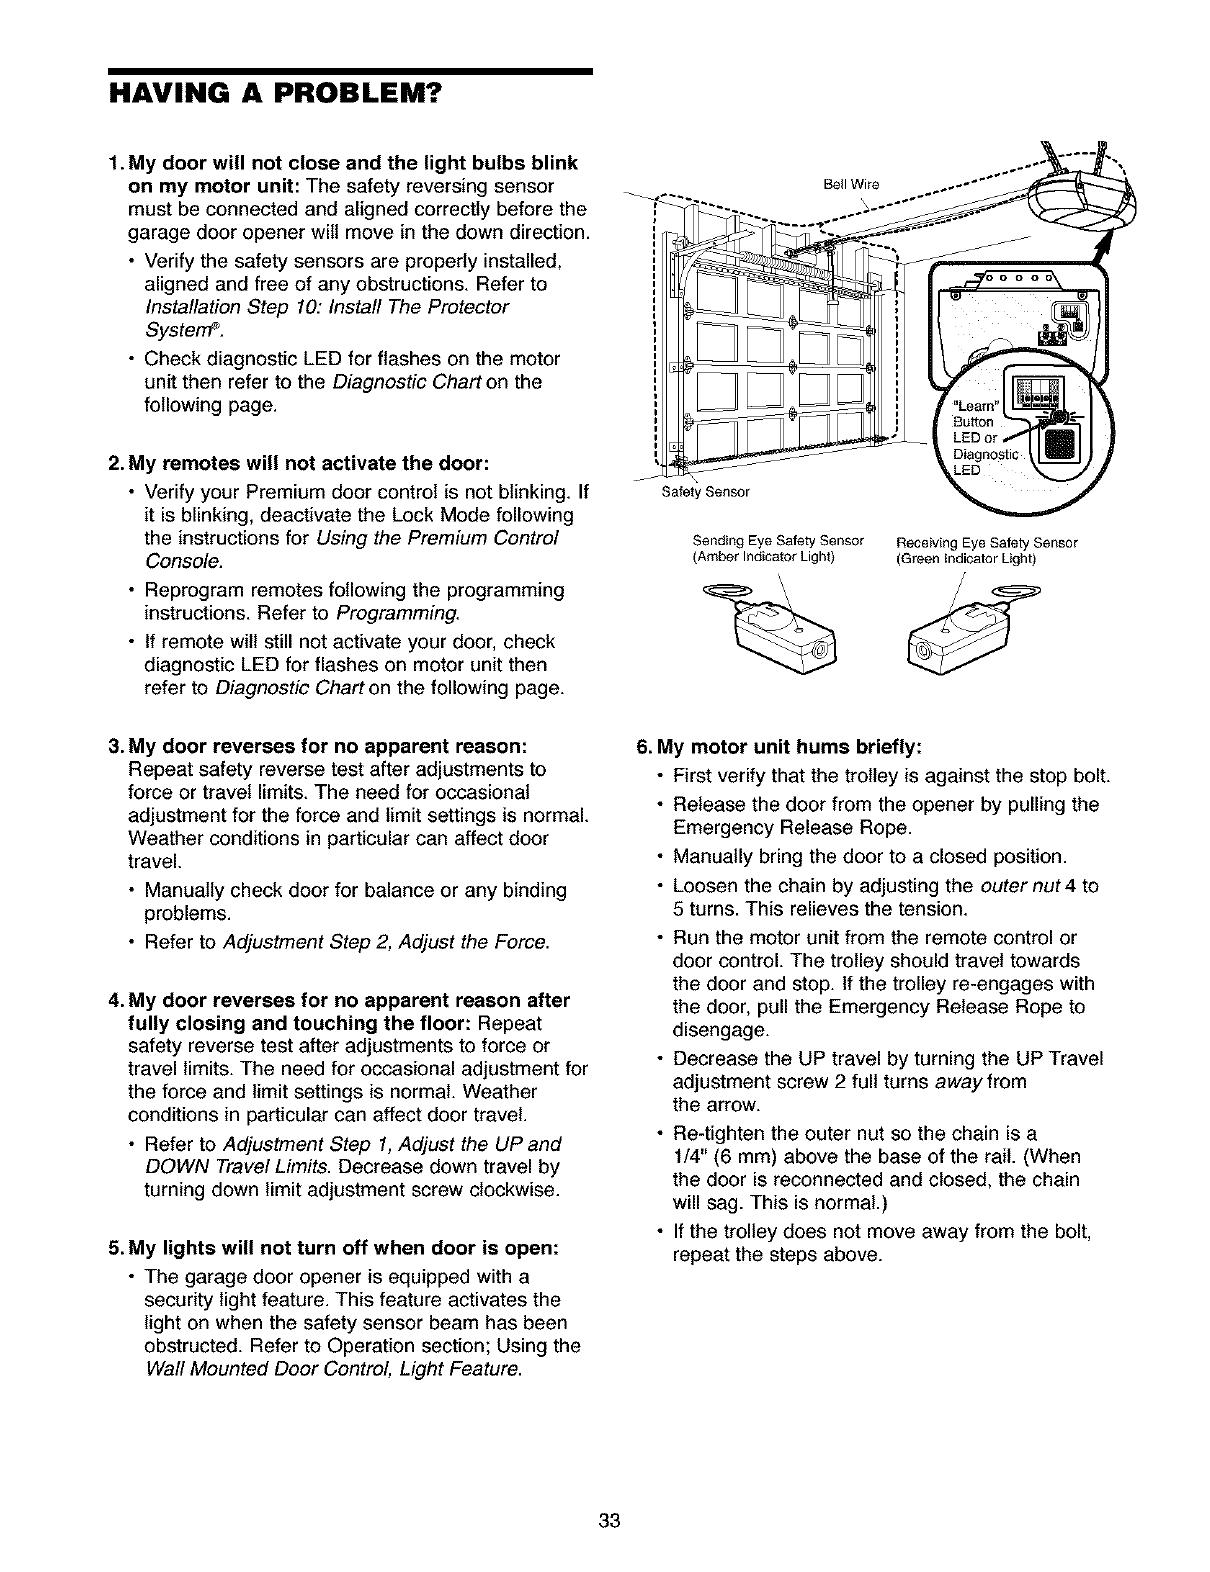 Garage Door Opener Safety Beam Troubleshooting Ideas Reversing Sensor Wiring Diagram Craftsman 1395398511 User Manual Manuals And